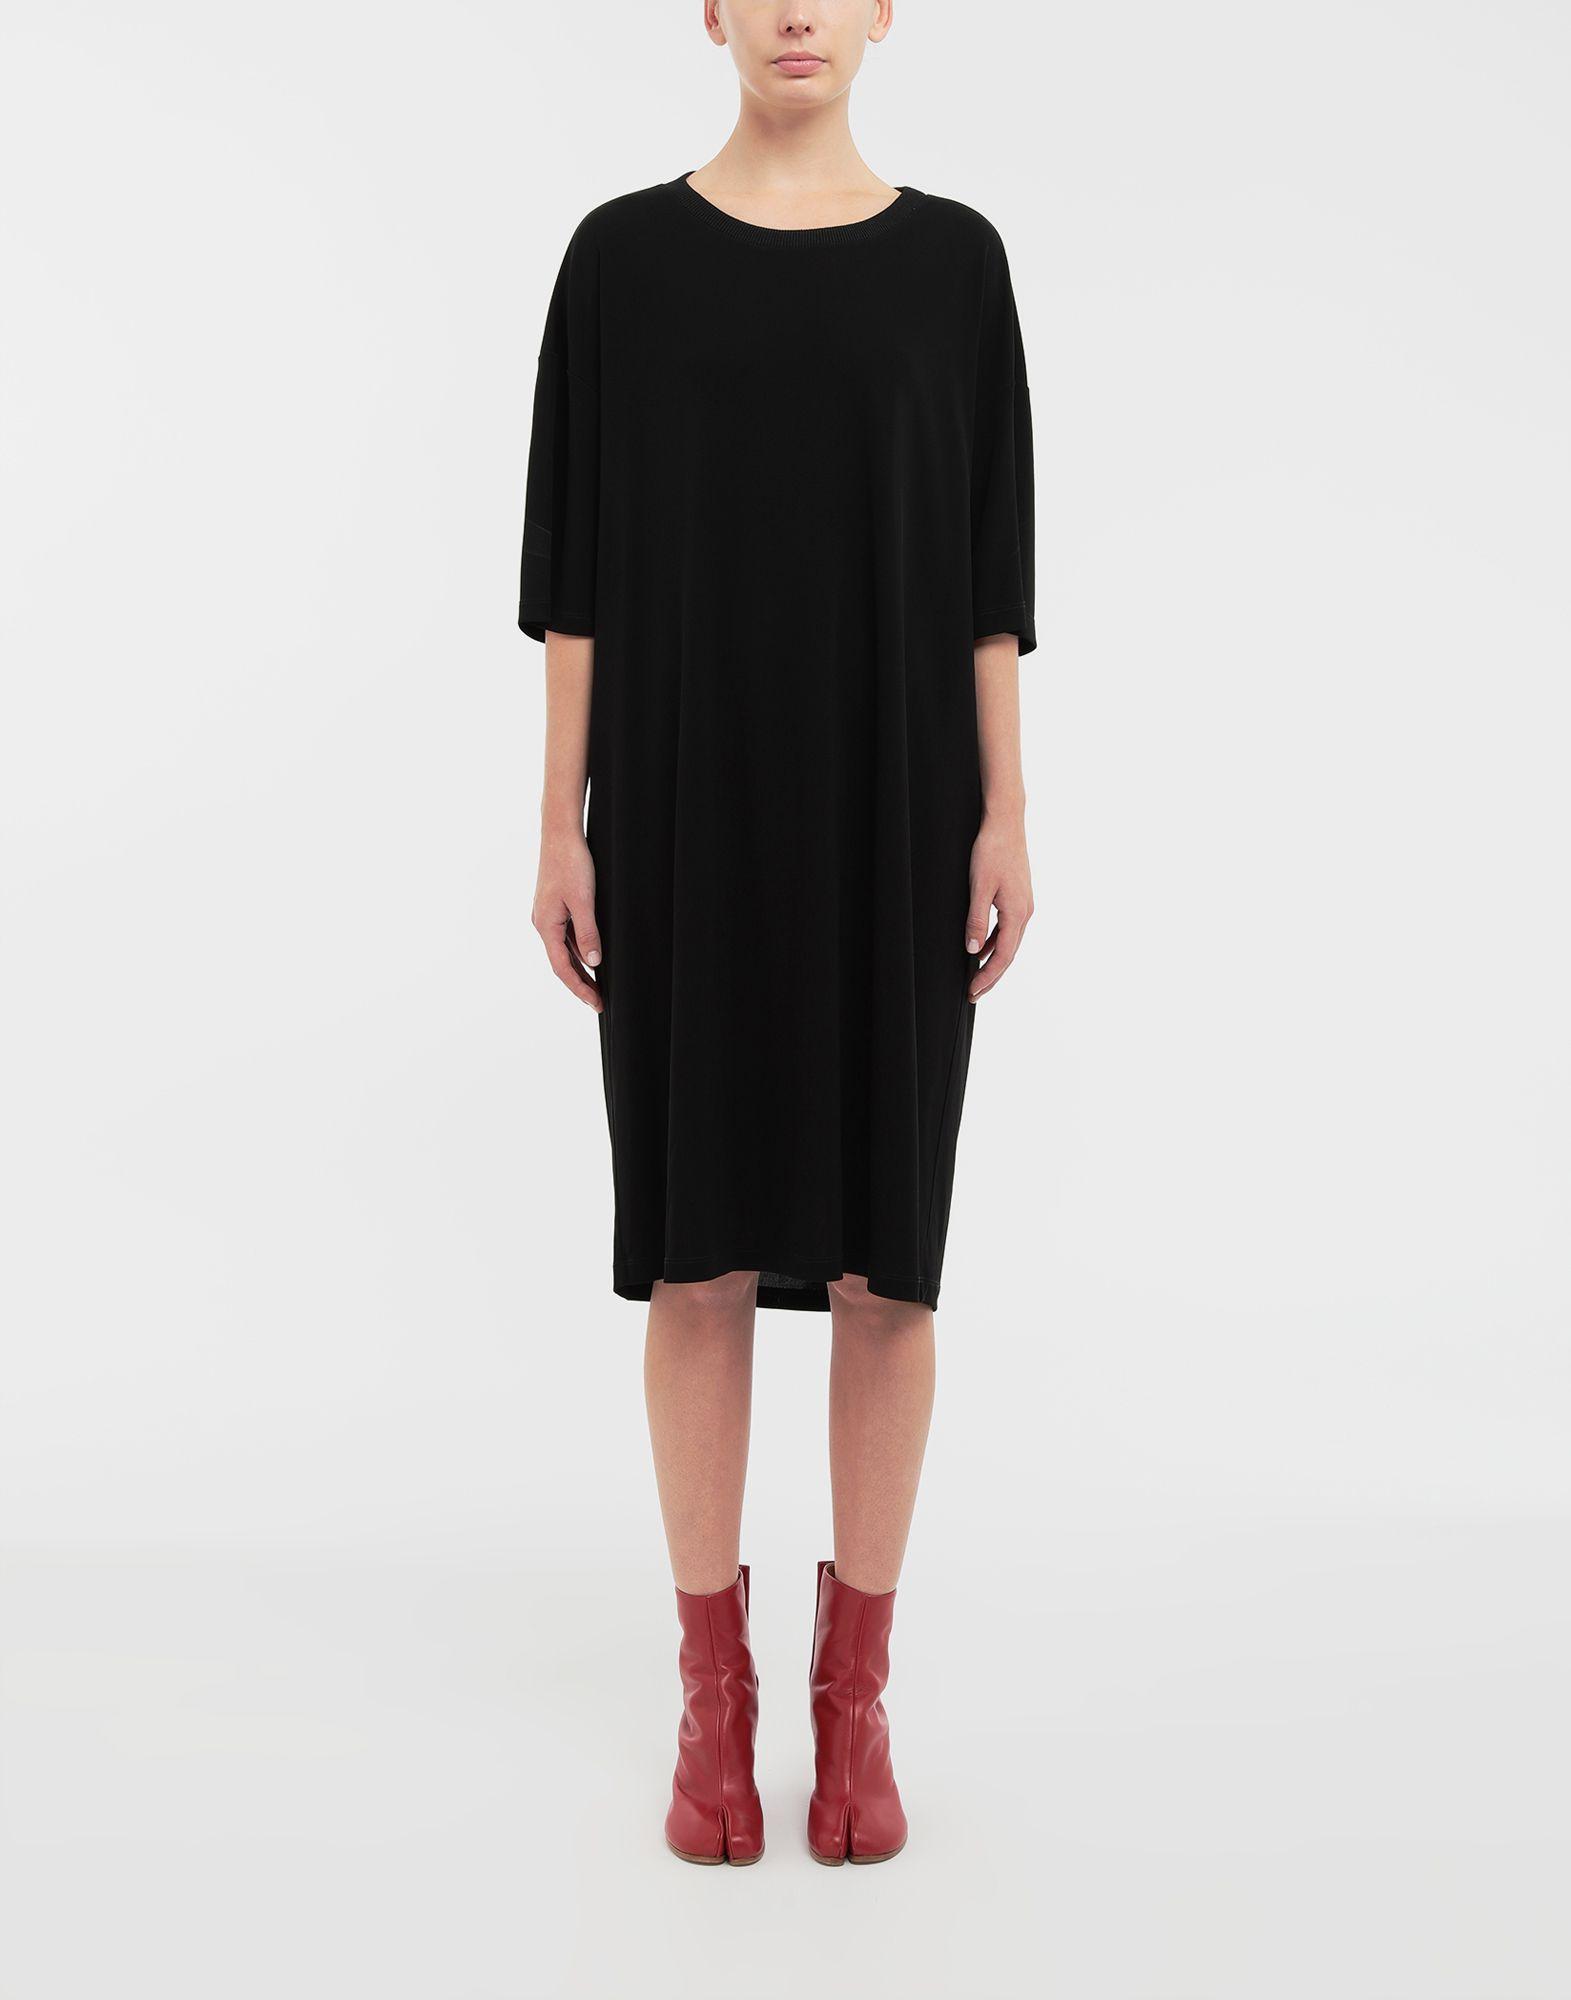 MAISON MARGIELA Ruched back jersey day dress Short dress Woman r